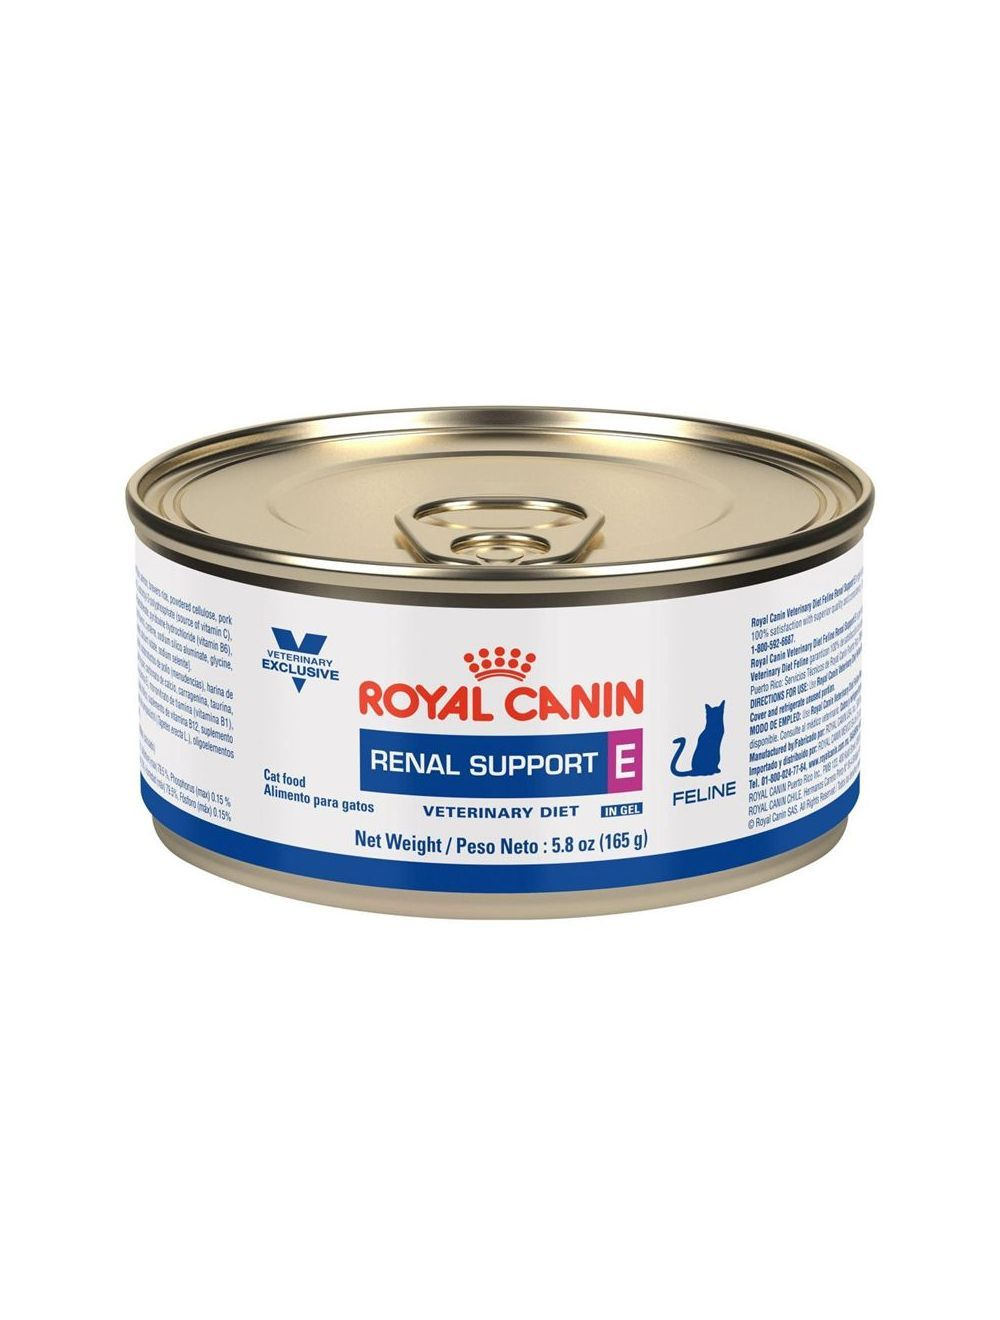 Royal Canin Cat Lata Renal Suport Wet x 156g